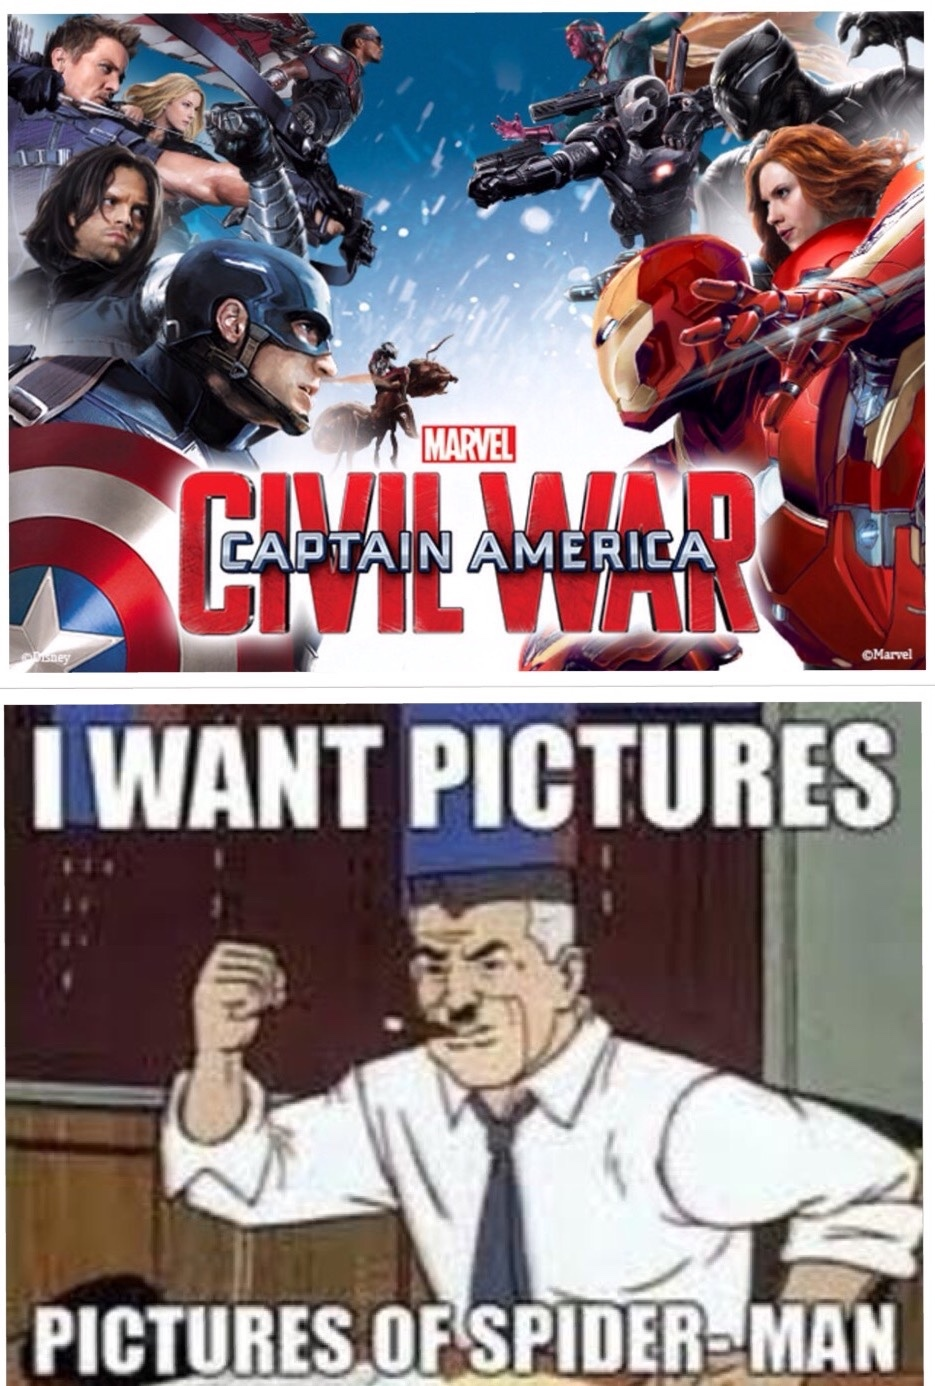 after I saw the new civil war promo art I'm just like - meme